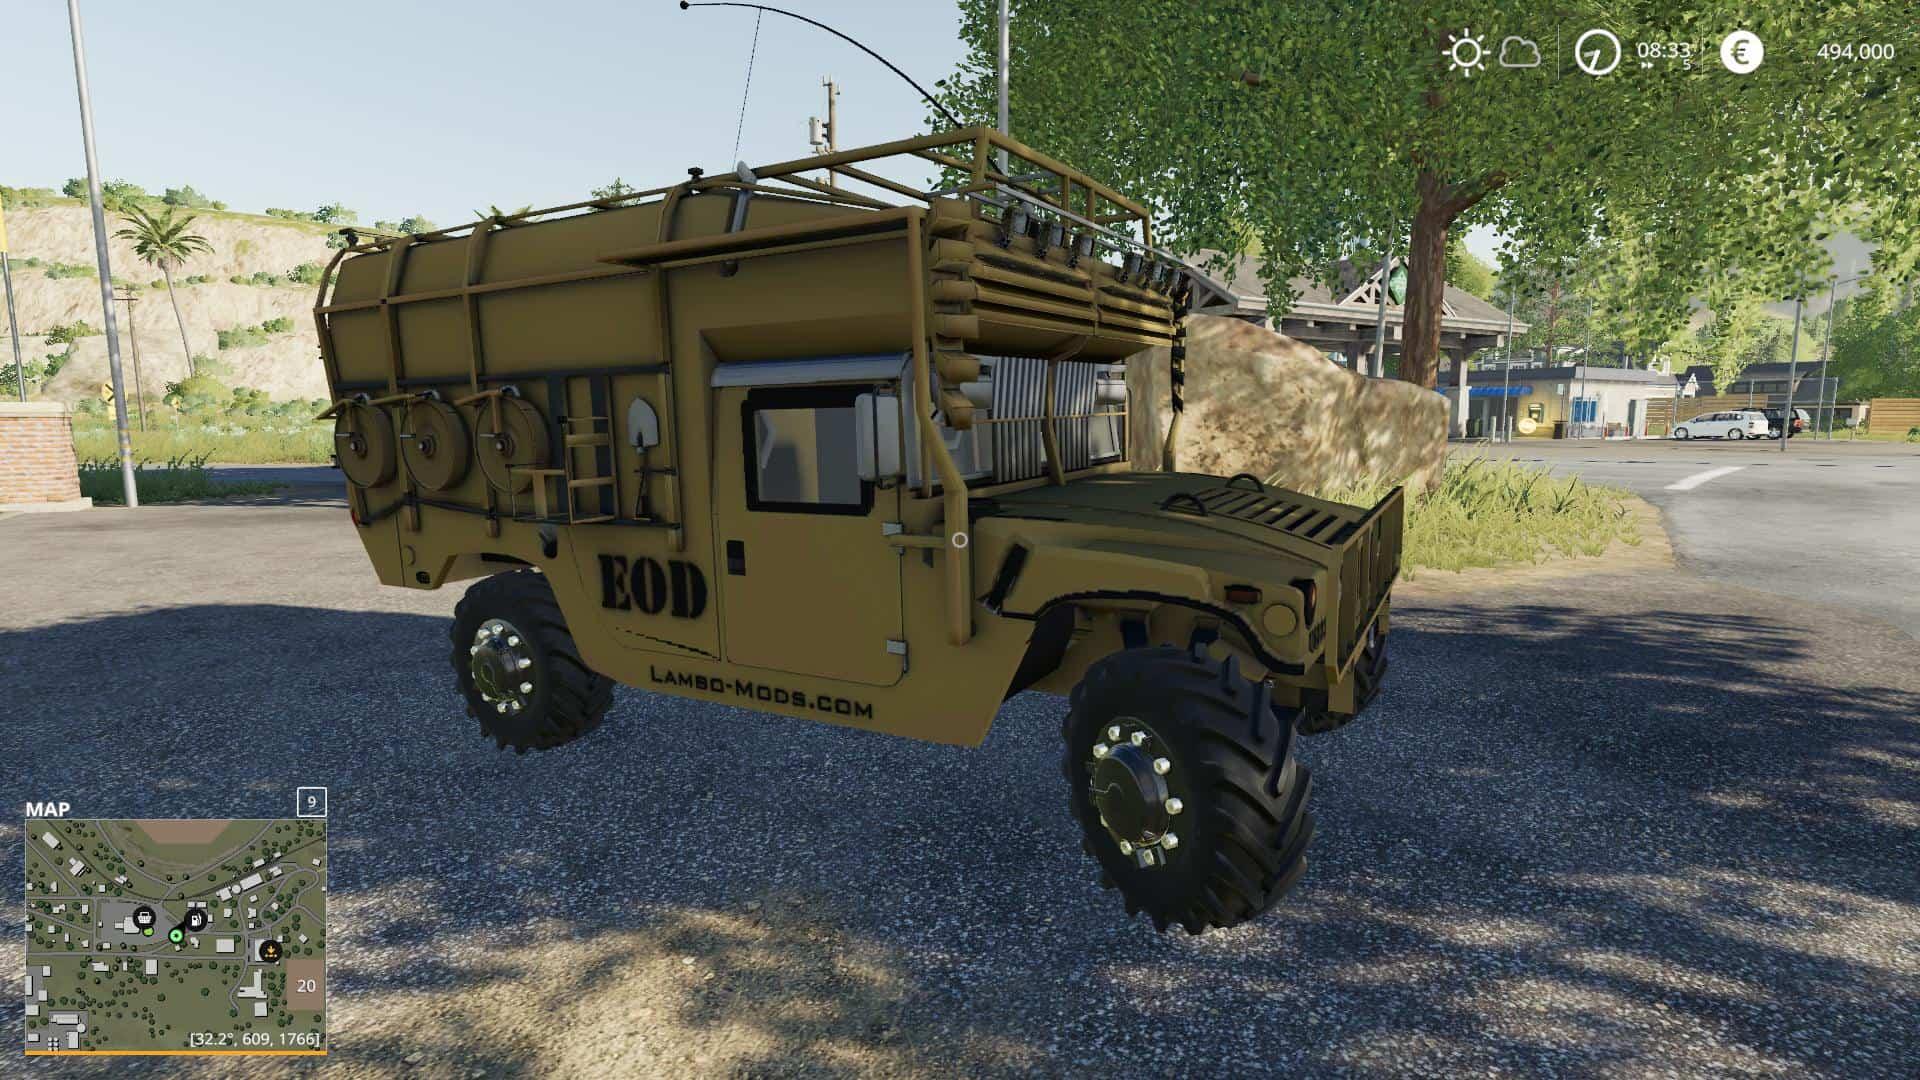 Army humvee v1 0 Mod - Farming Simulator 19 Mod / FS19